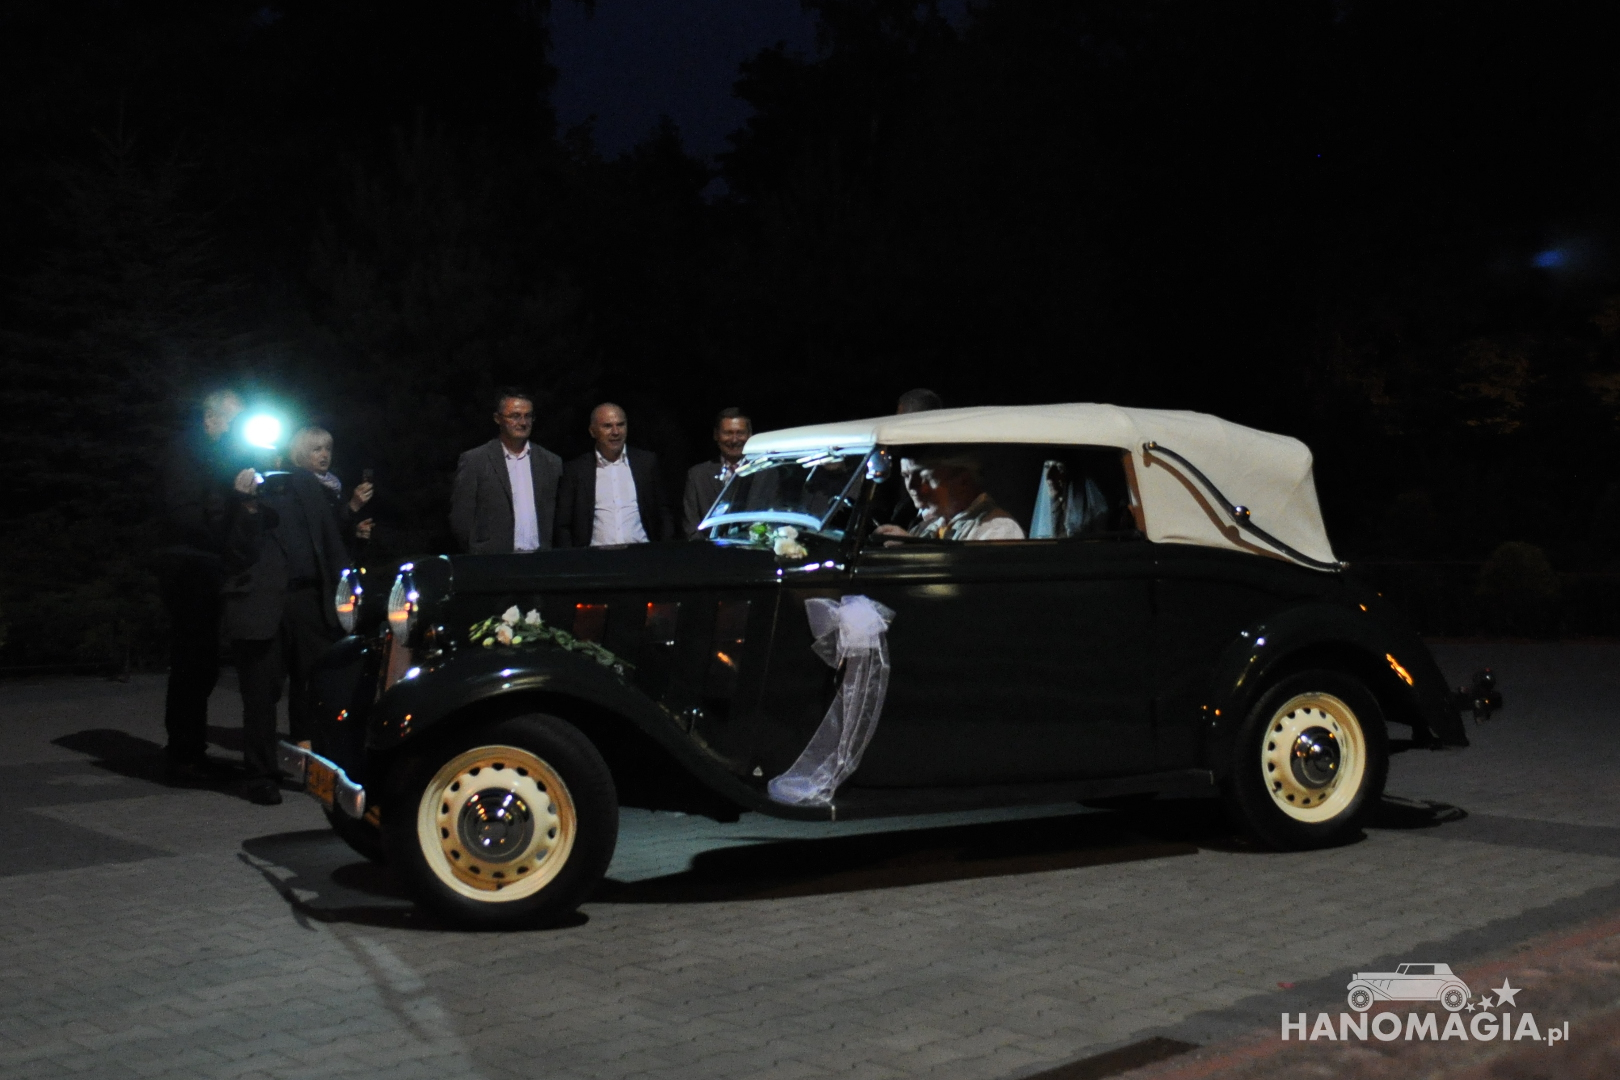 Hanomag Rekord - Galeria zdjęć